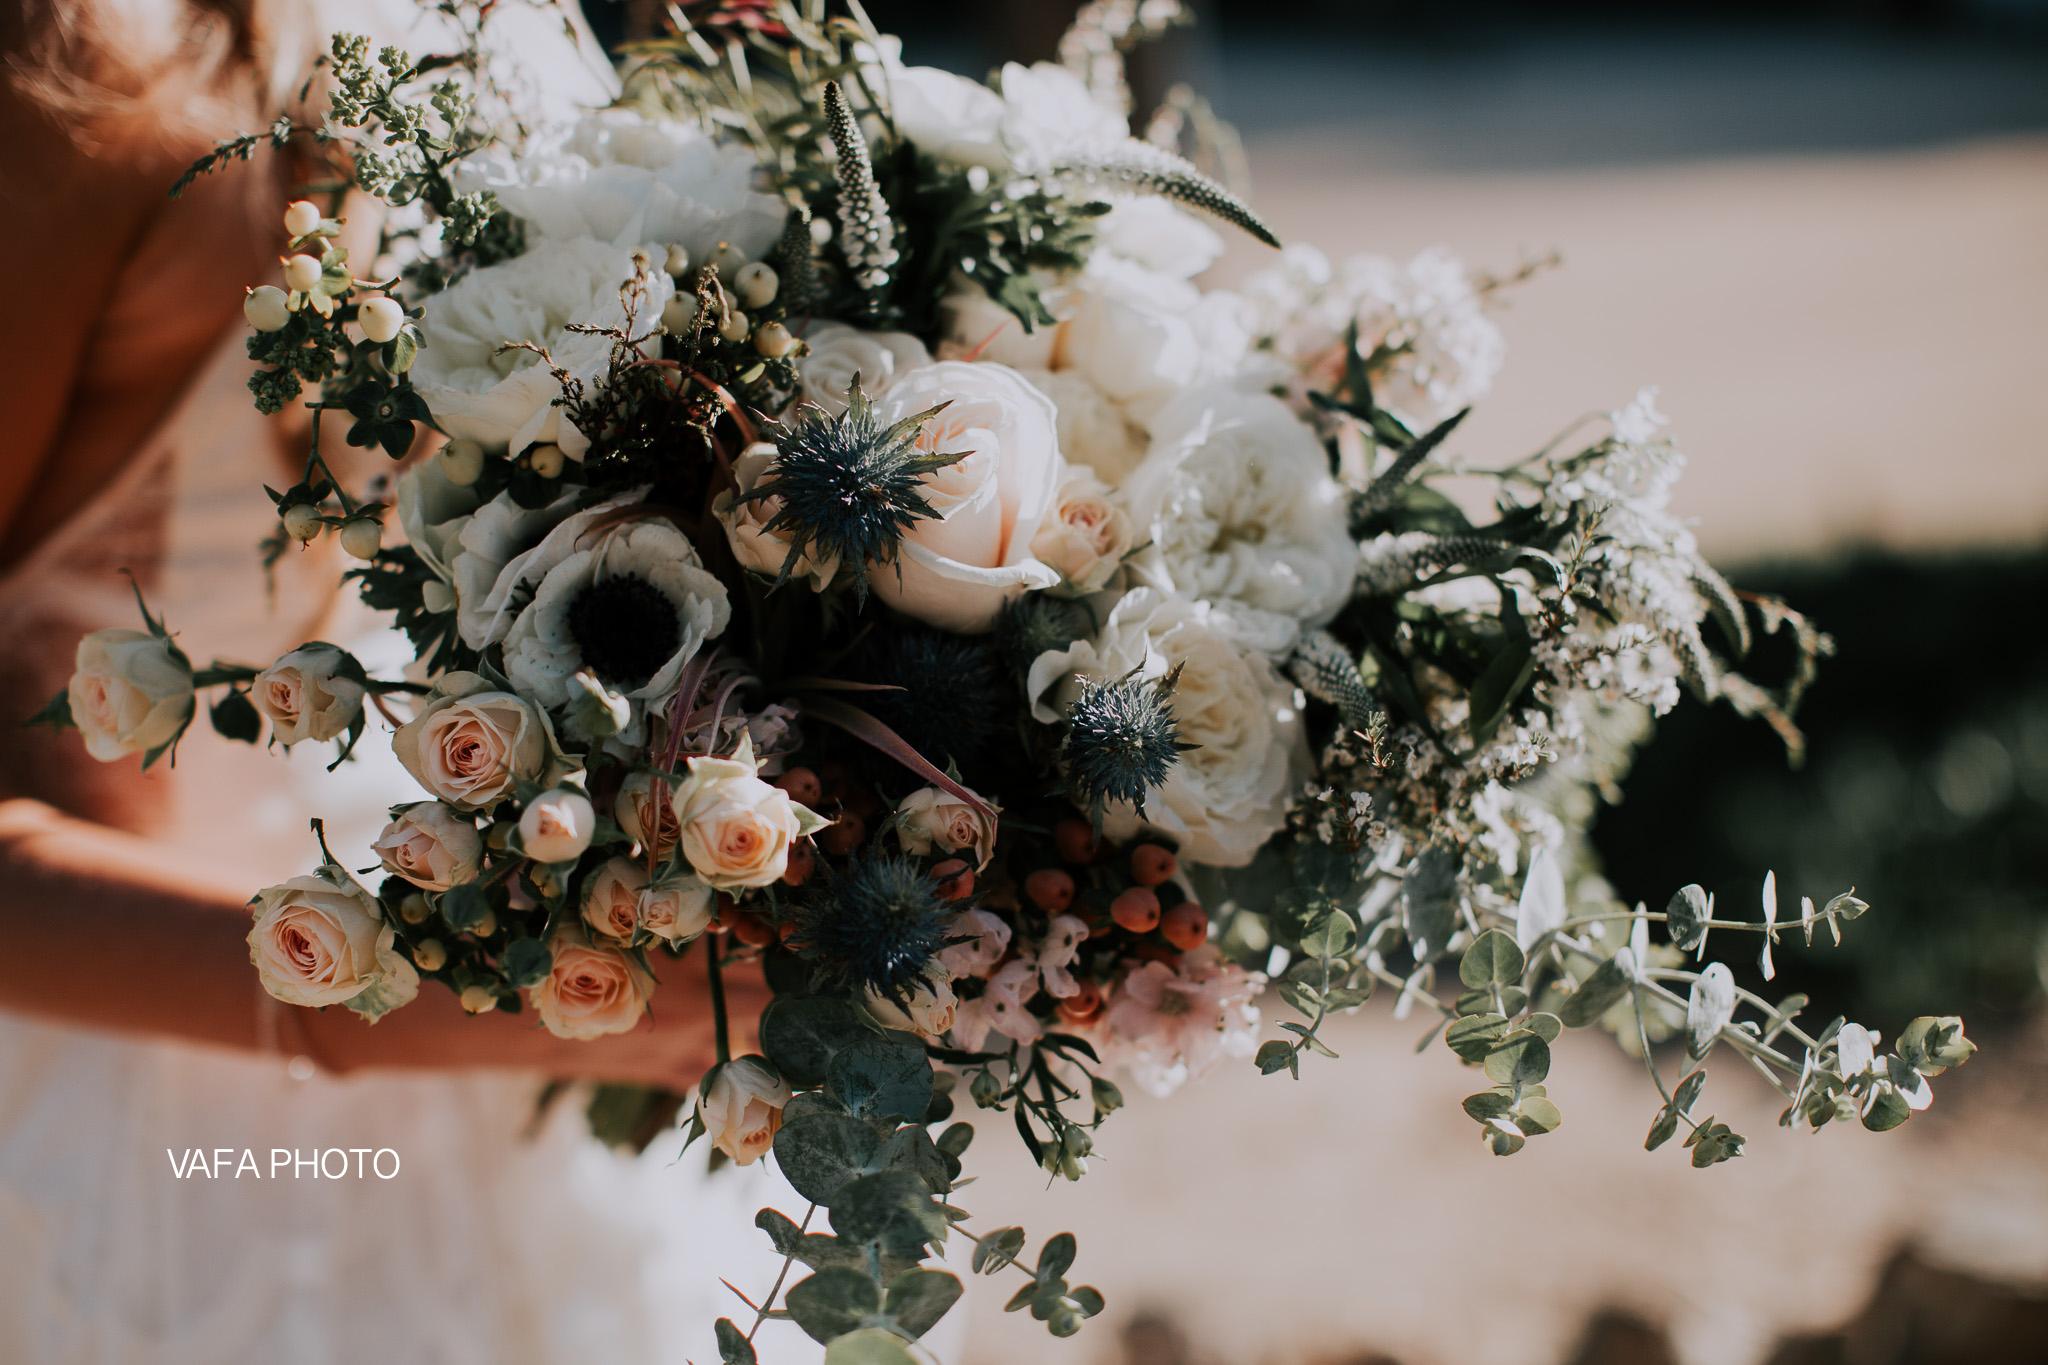 Leo-Carrillo-Ranch-Wedding-Lauren-Mike-Vafa-Photo-731.jpg